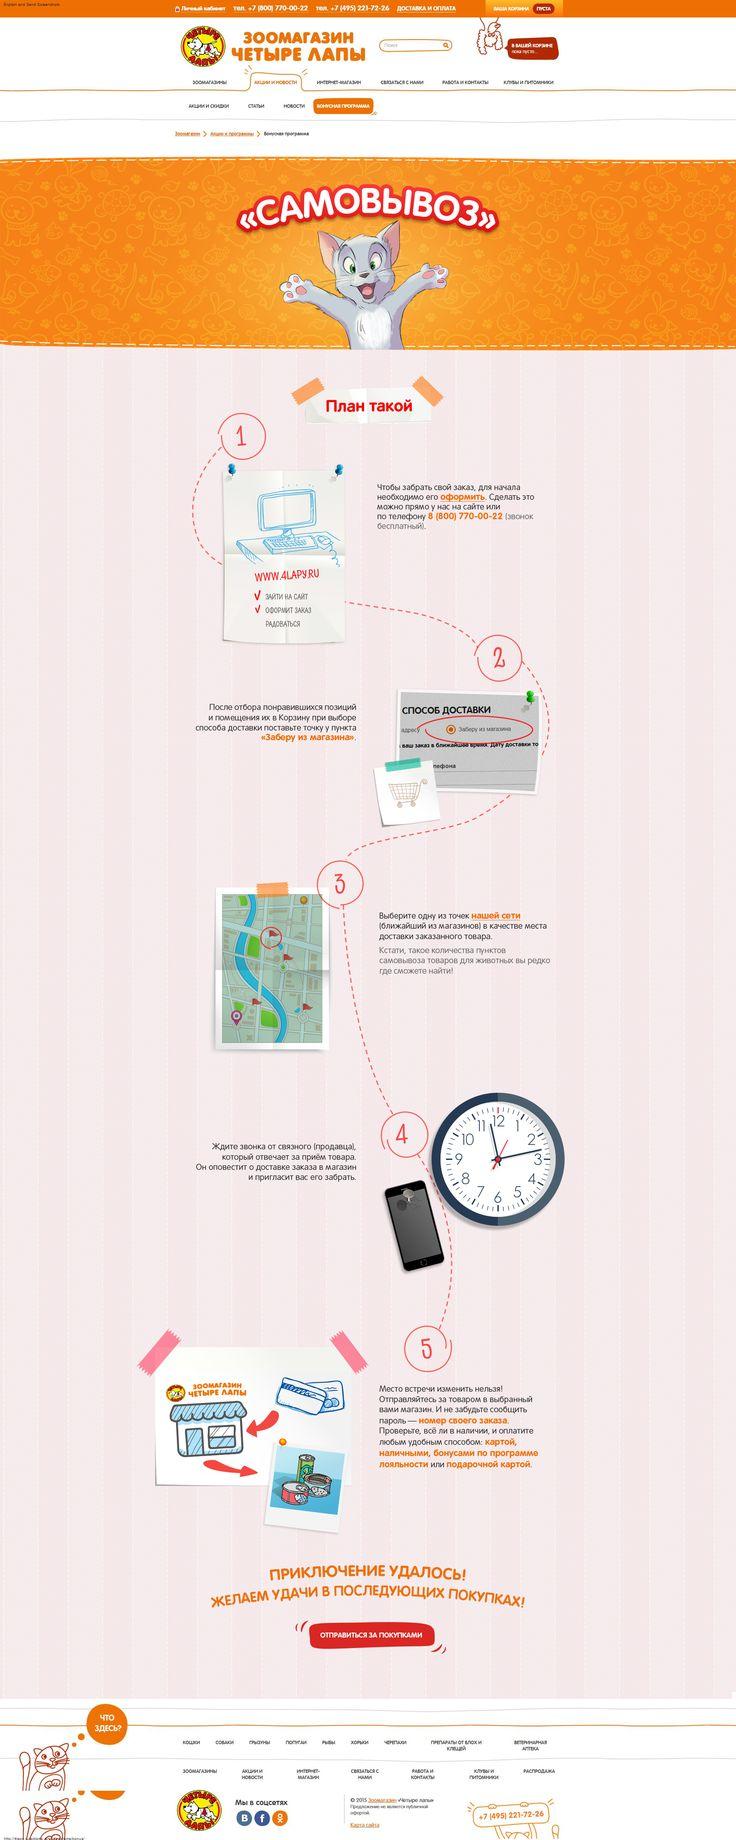 CHETYRE LAPY: A plan to buy to pick-up. Easy, comfortable and quick. // ЧЕТЫРЕ ЛАПЫ: План по покупке с самовывозом: легко, удобно и быстро. #EMAILMATRIX #emailmarketing #landingpage